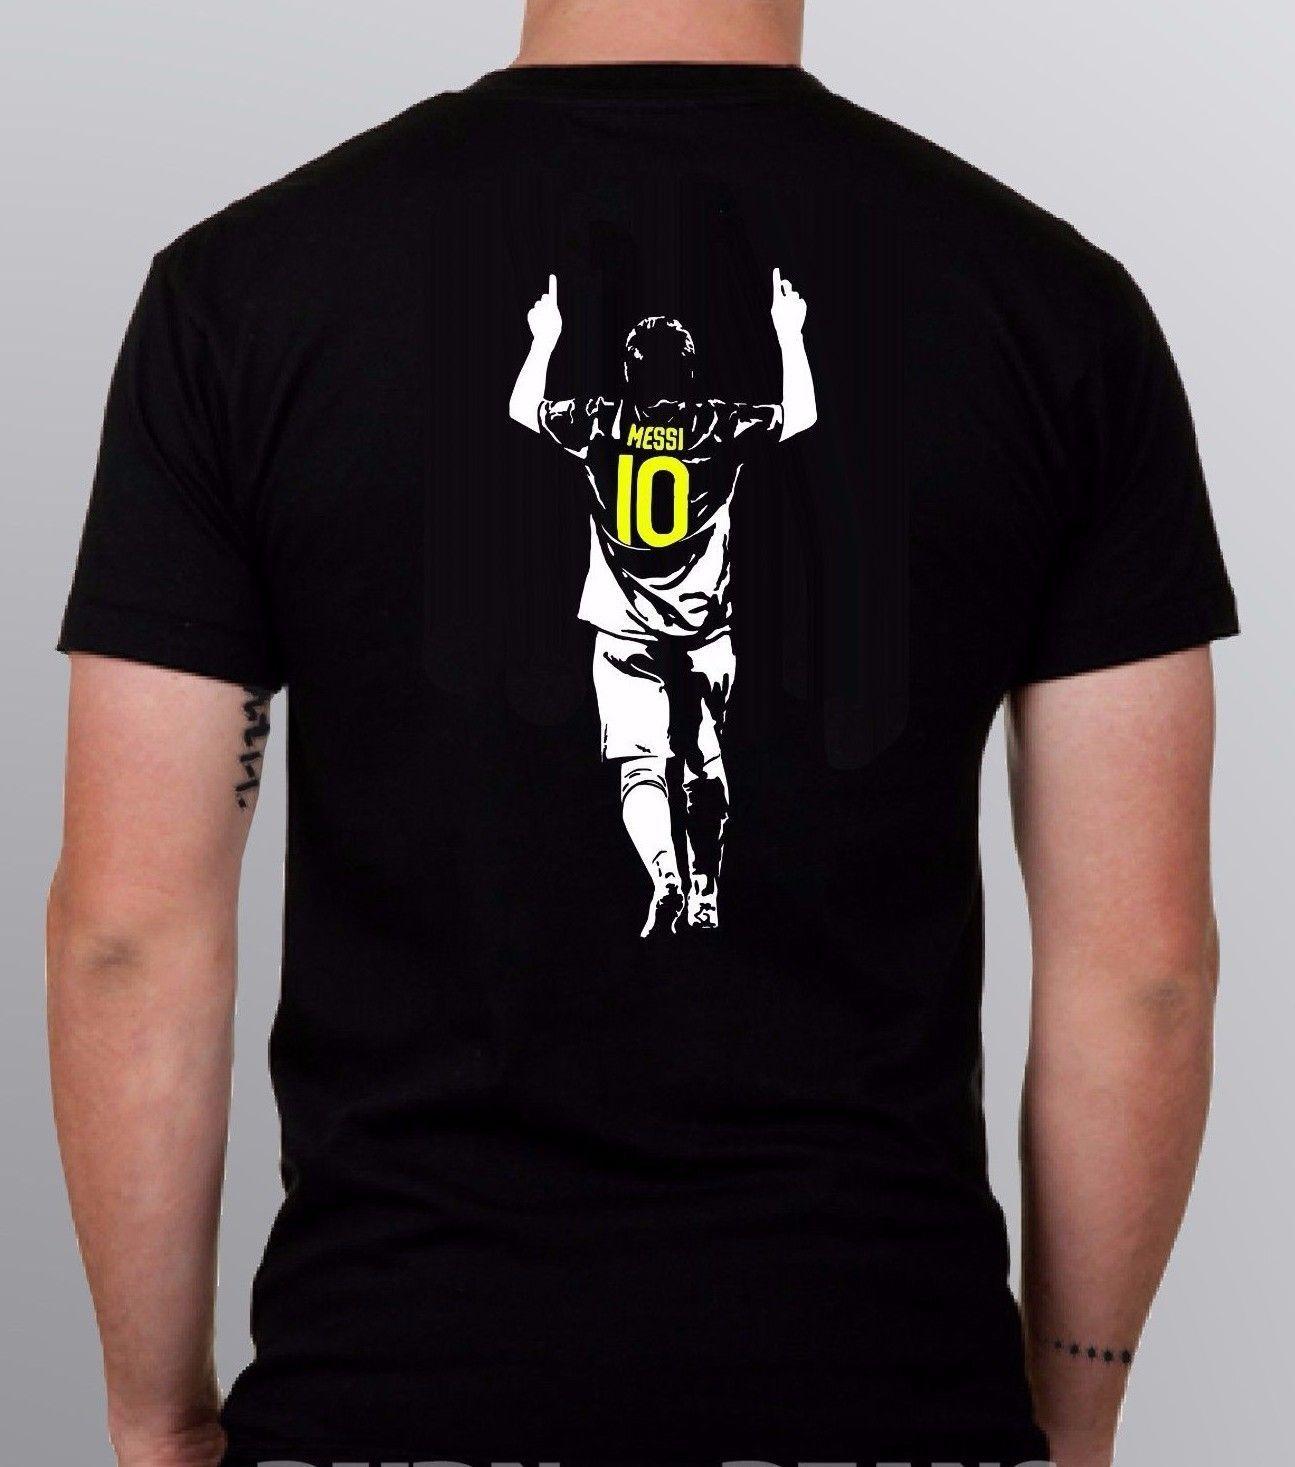 3f4f475ed9 Compre Messi Camiseta Lionel 10 Argentina Barcelona Futebol S 5XL + CRIANÇAS  TAMANHOS! De Unrestrainedtshirts